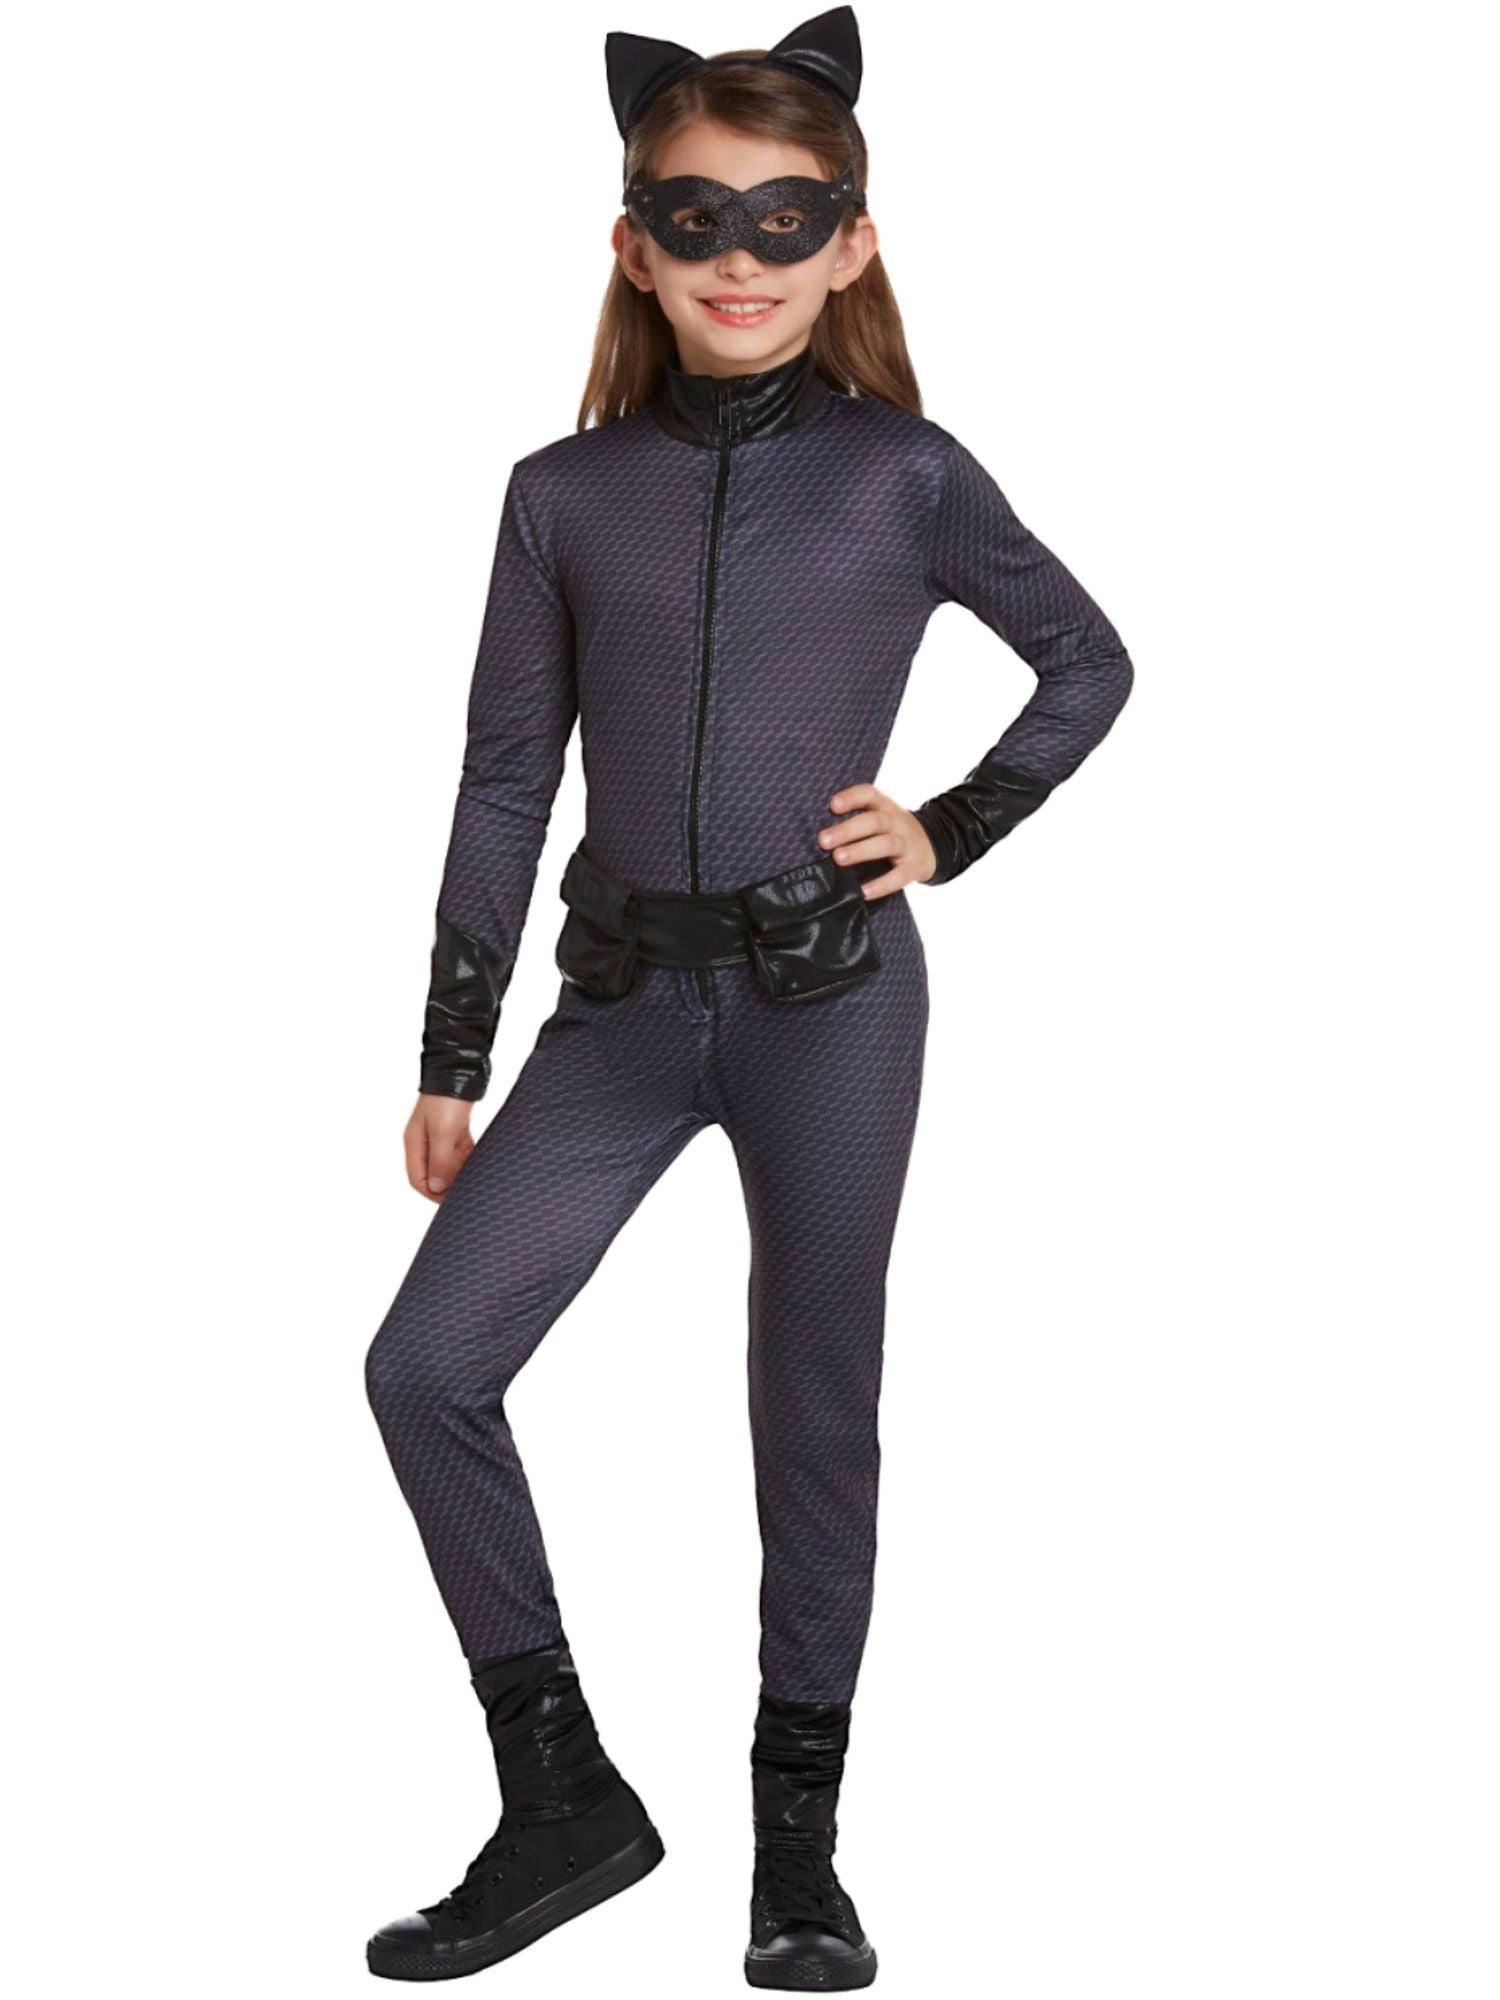 Medium Rubies Girls Batwoman Costume Jumpsuit and Mask